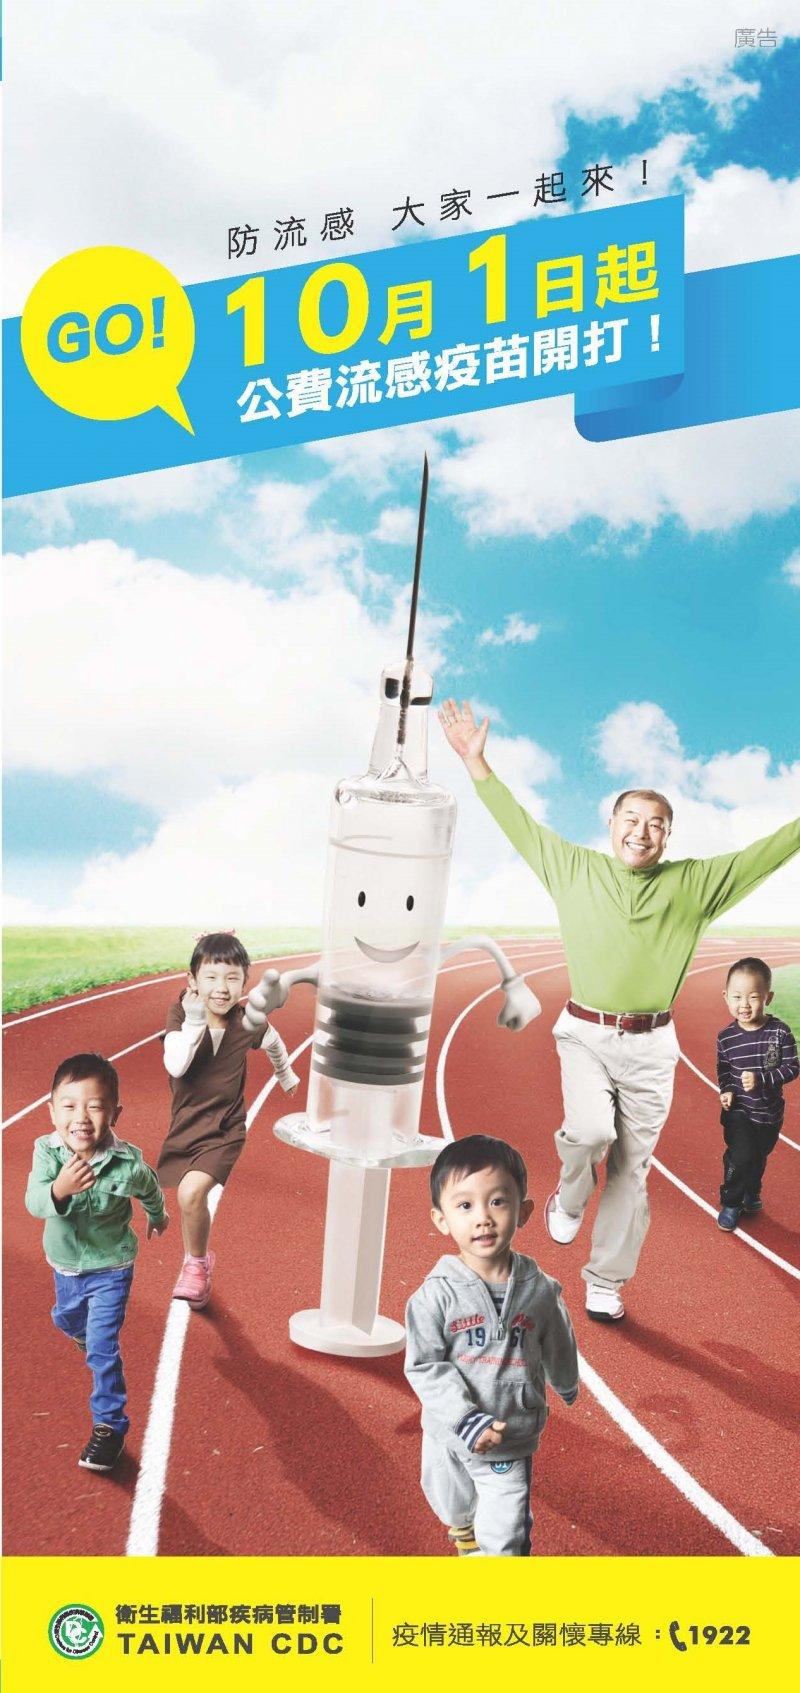 20160908-SMG0045-005-流感疫苗開放接種。(取自衛福部廣告海報).jpg